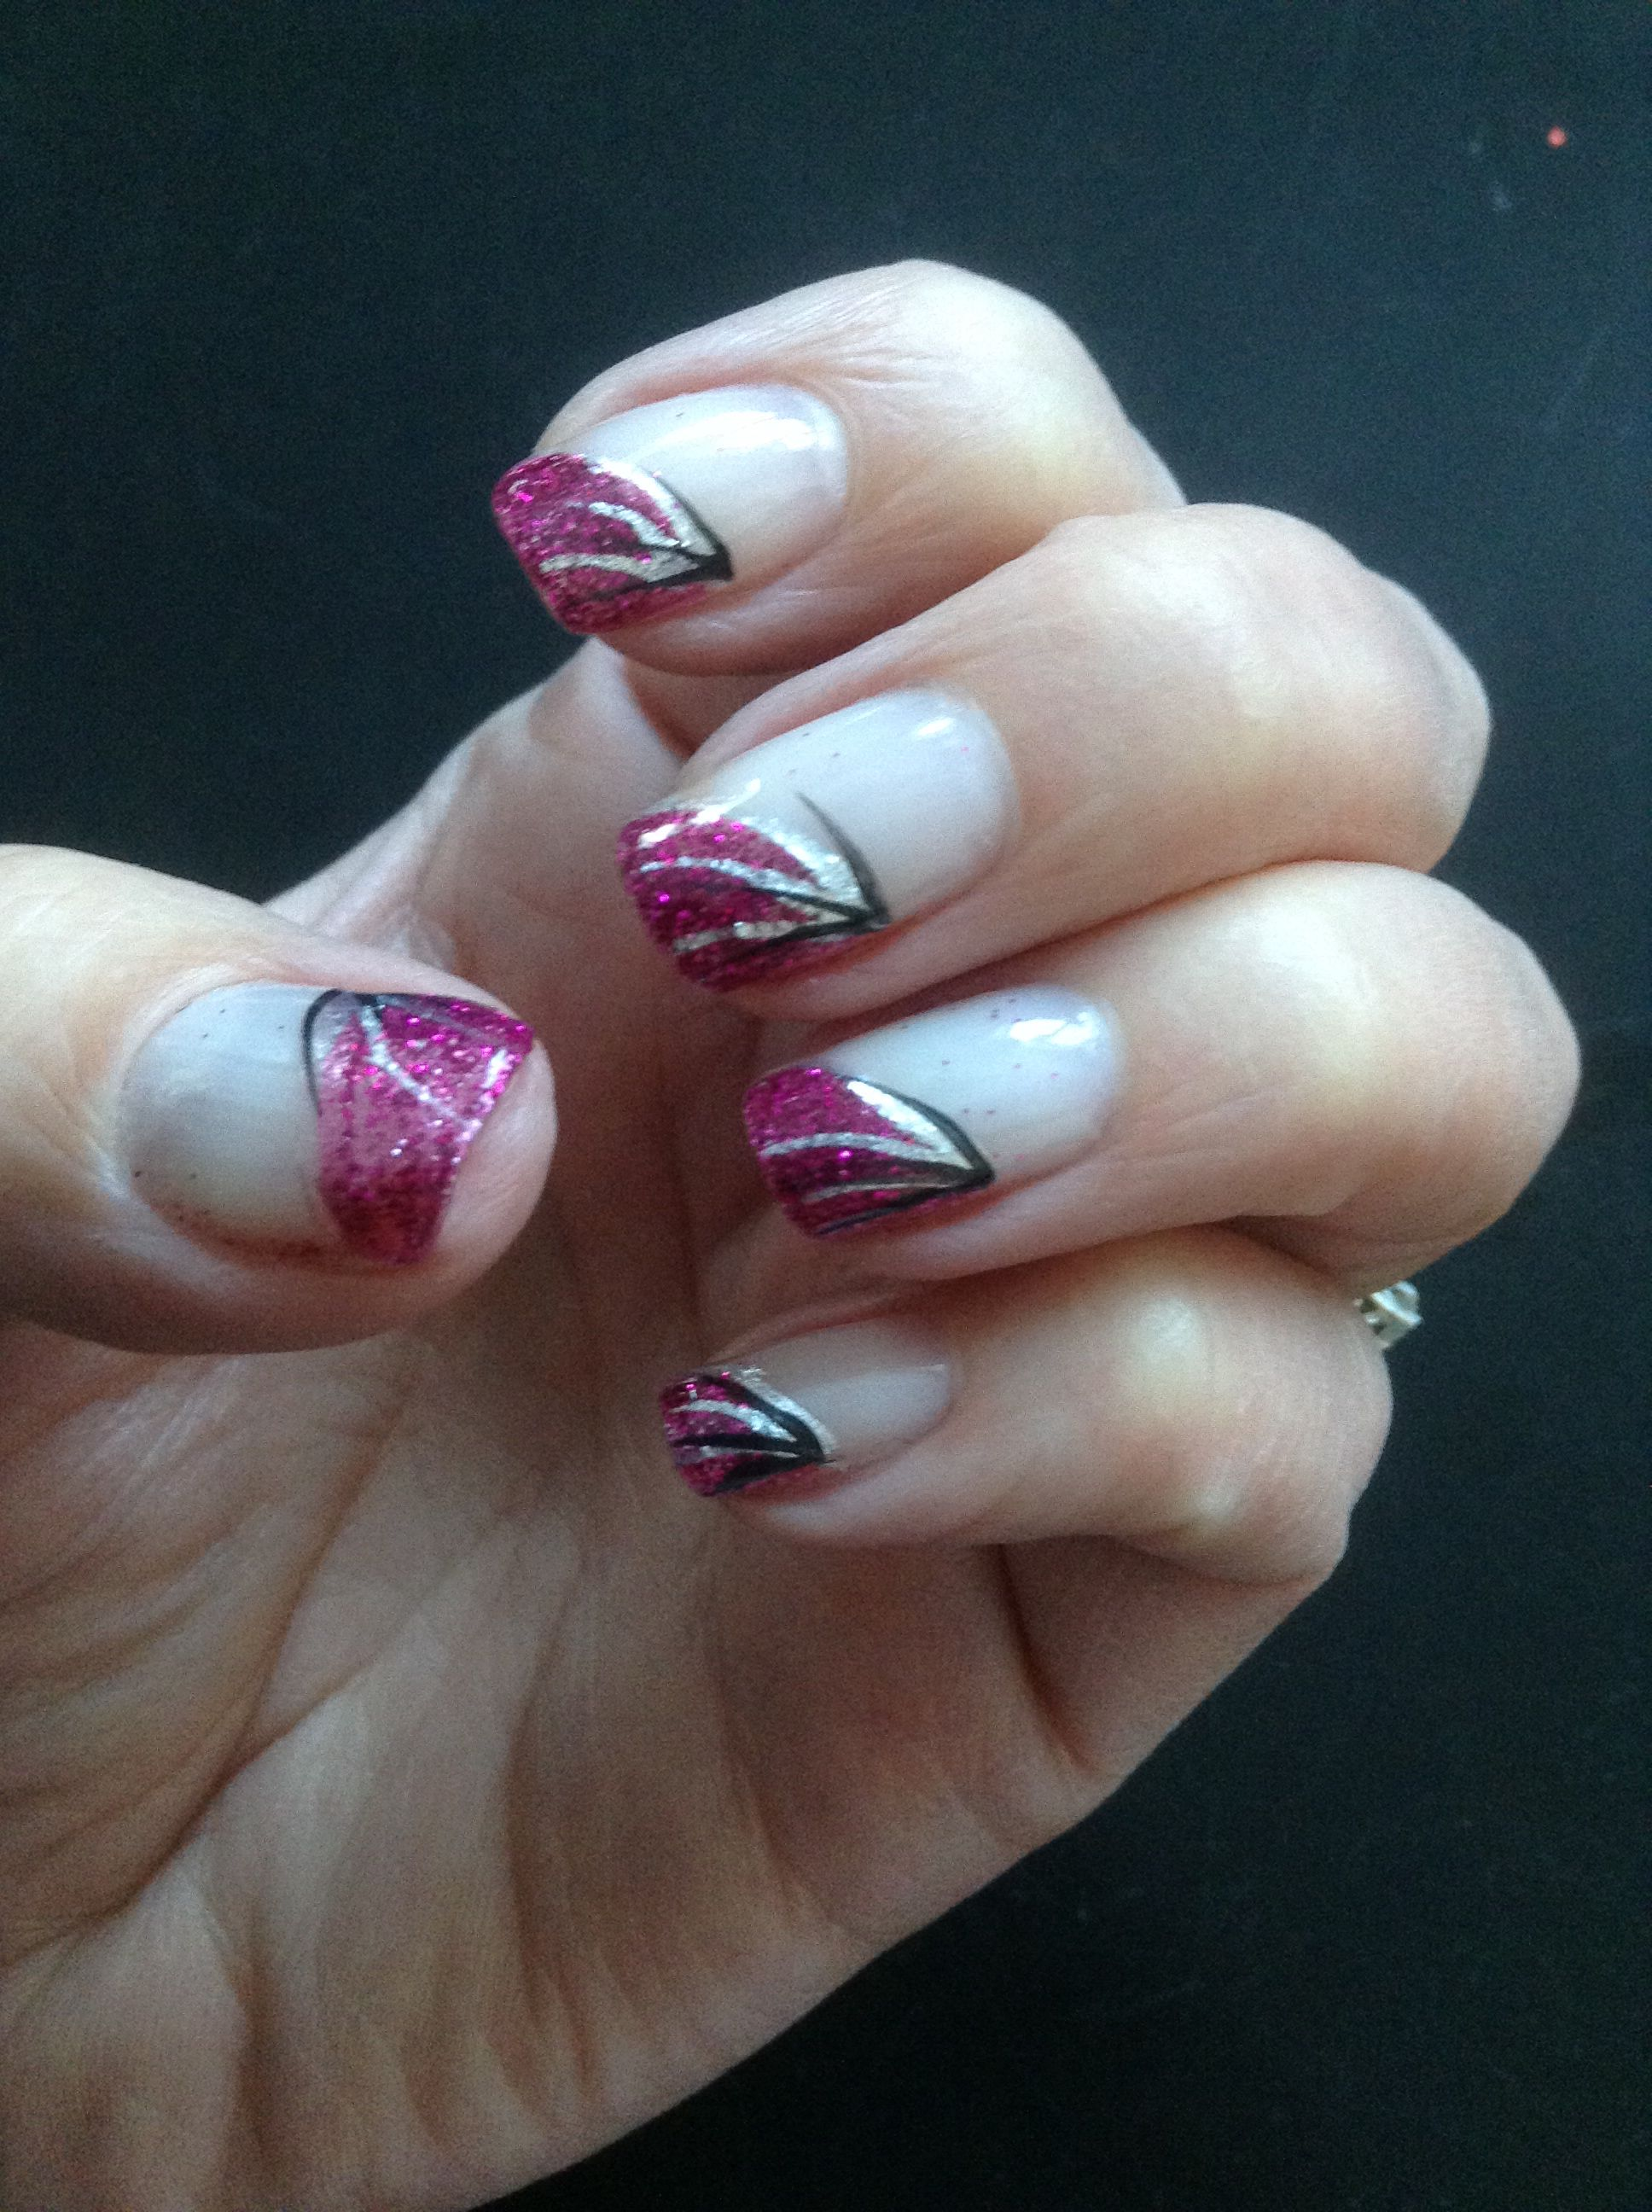 Nails by Nancy :) Pretty in pink